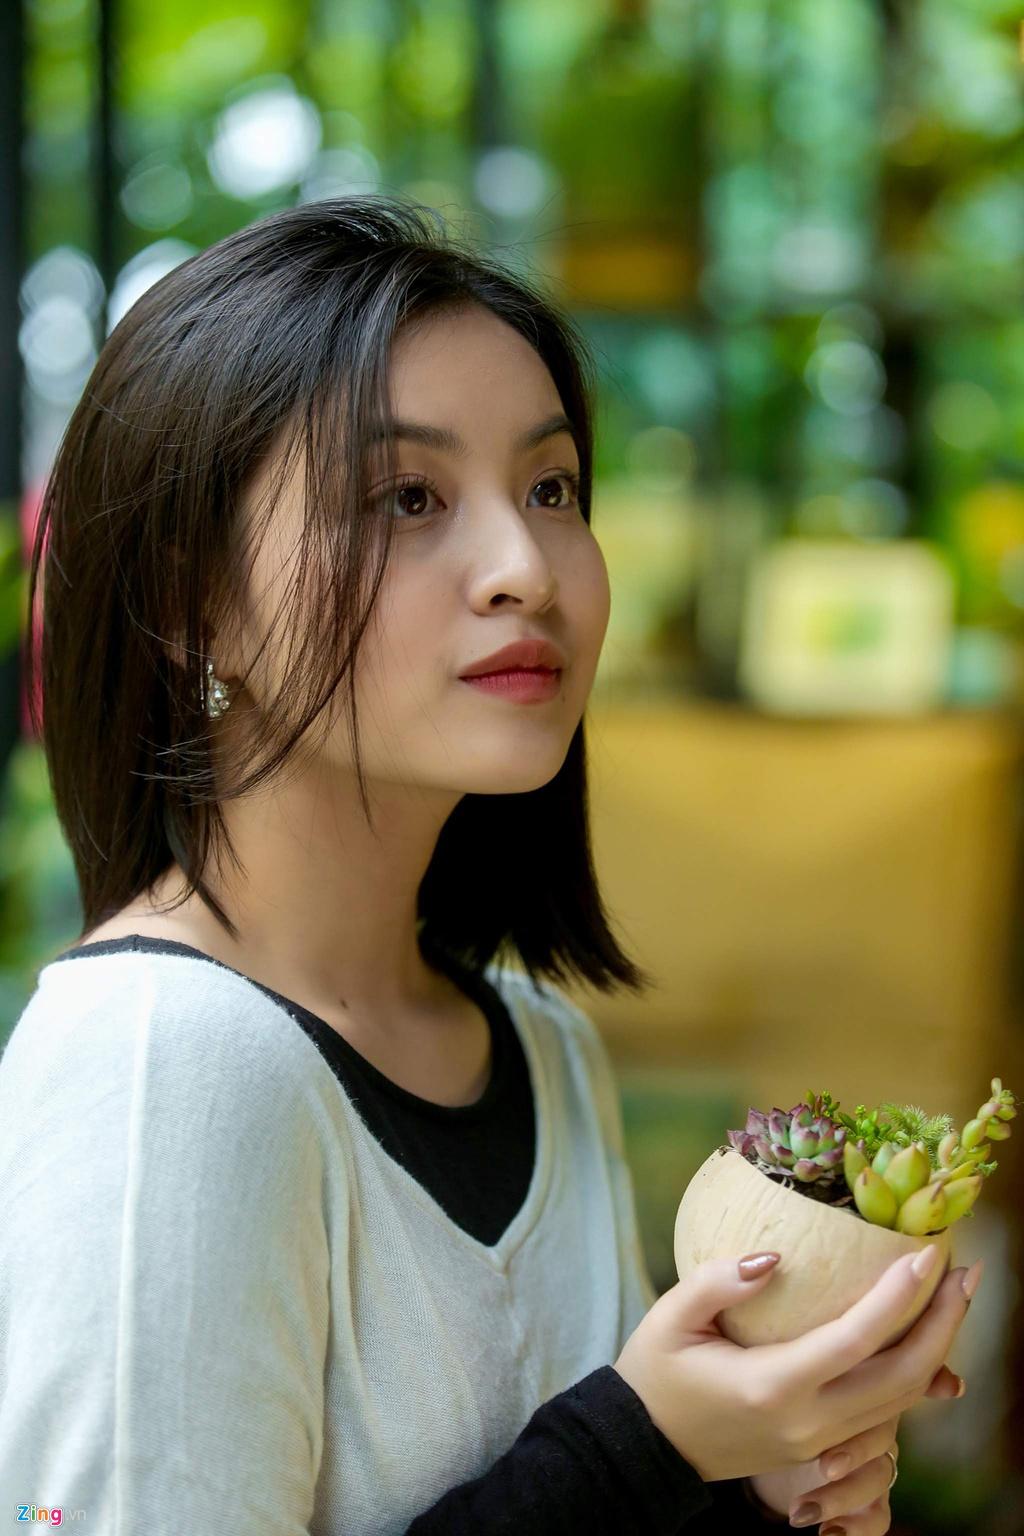 Nhan sac doi thuong cua hai hot girl phim 'Mat biec' hinh anh 6 mat_biec_zing15.jpg